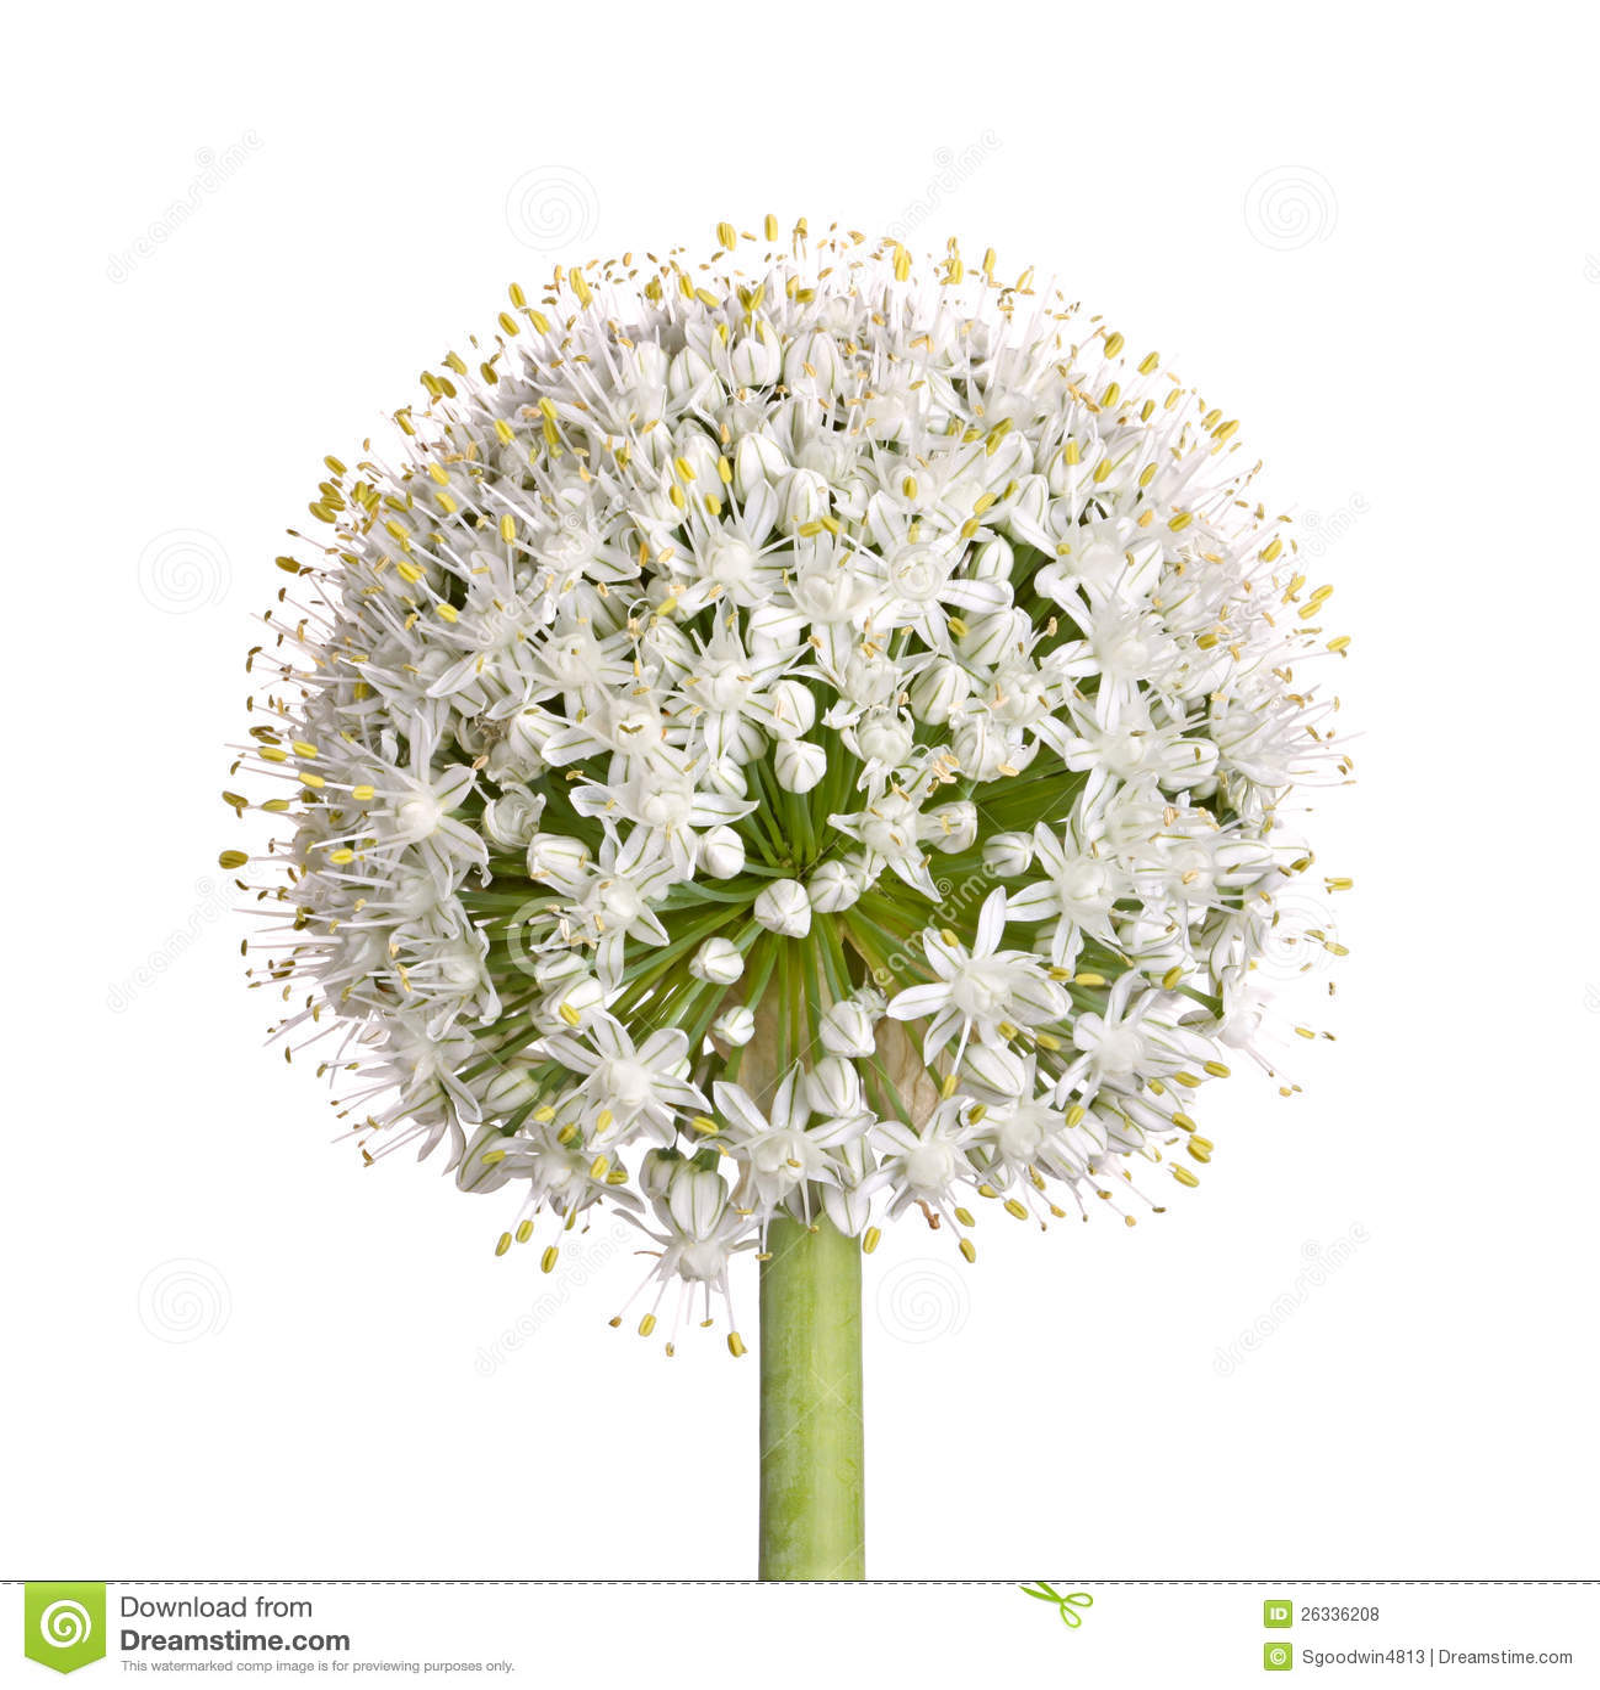 Flower Head Of An Onion  Allium Cepa  On White Stock Photo